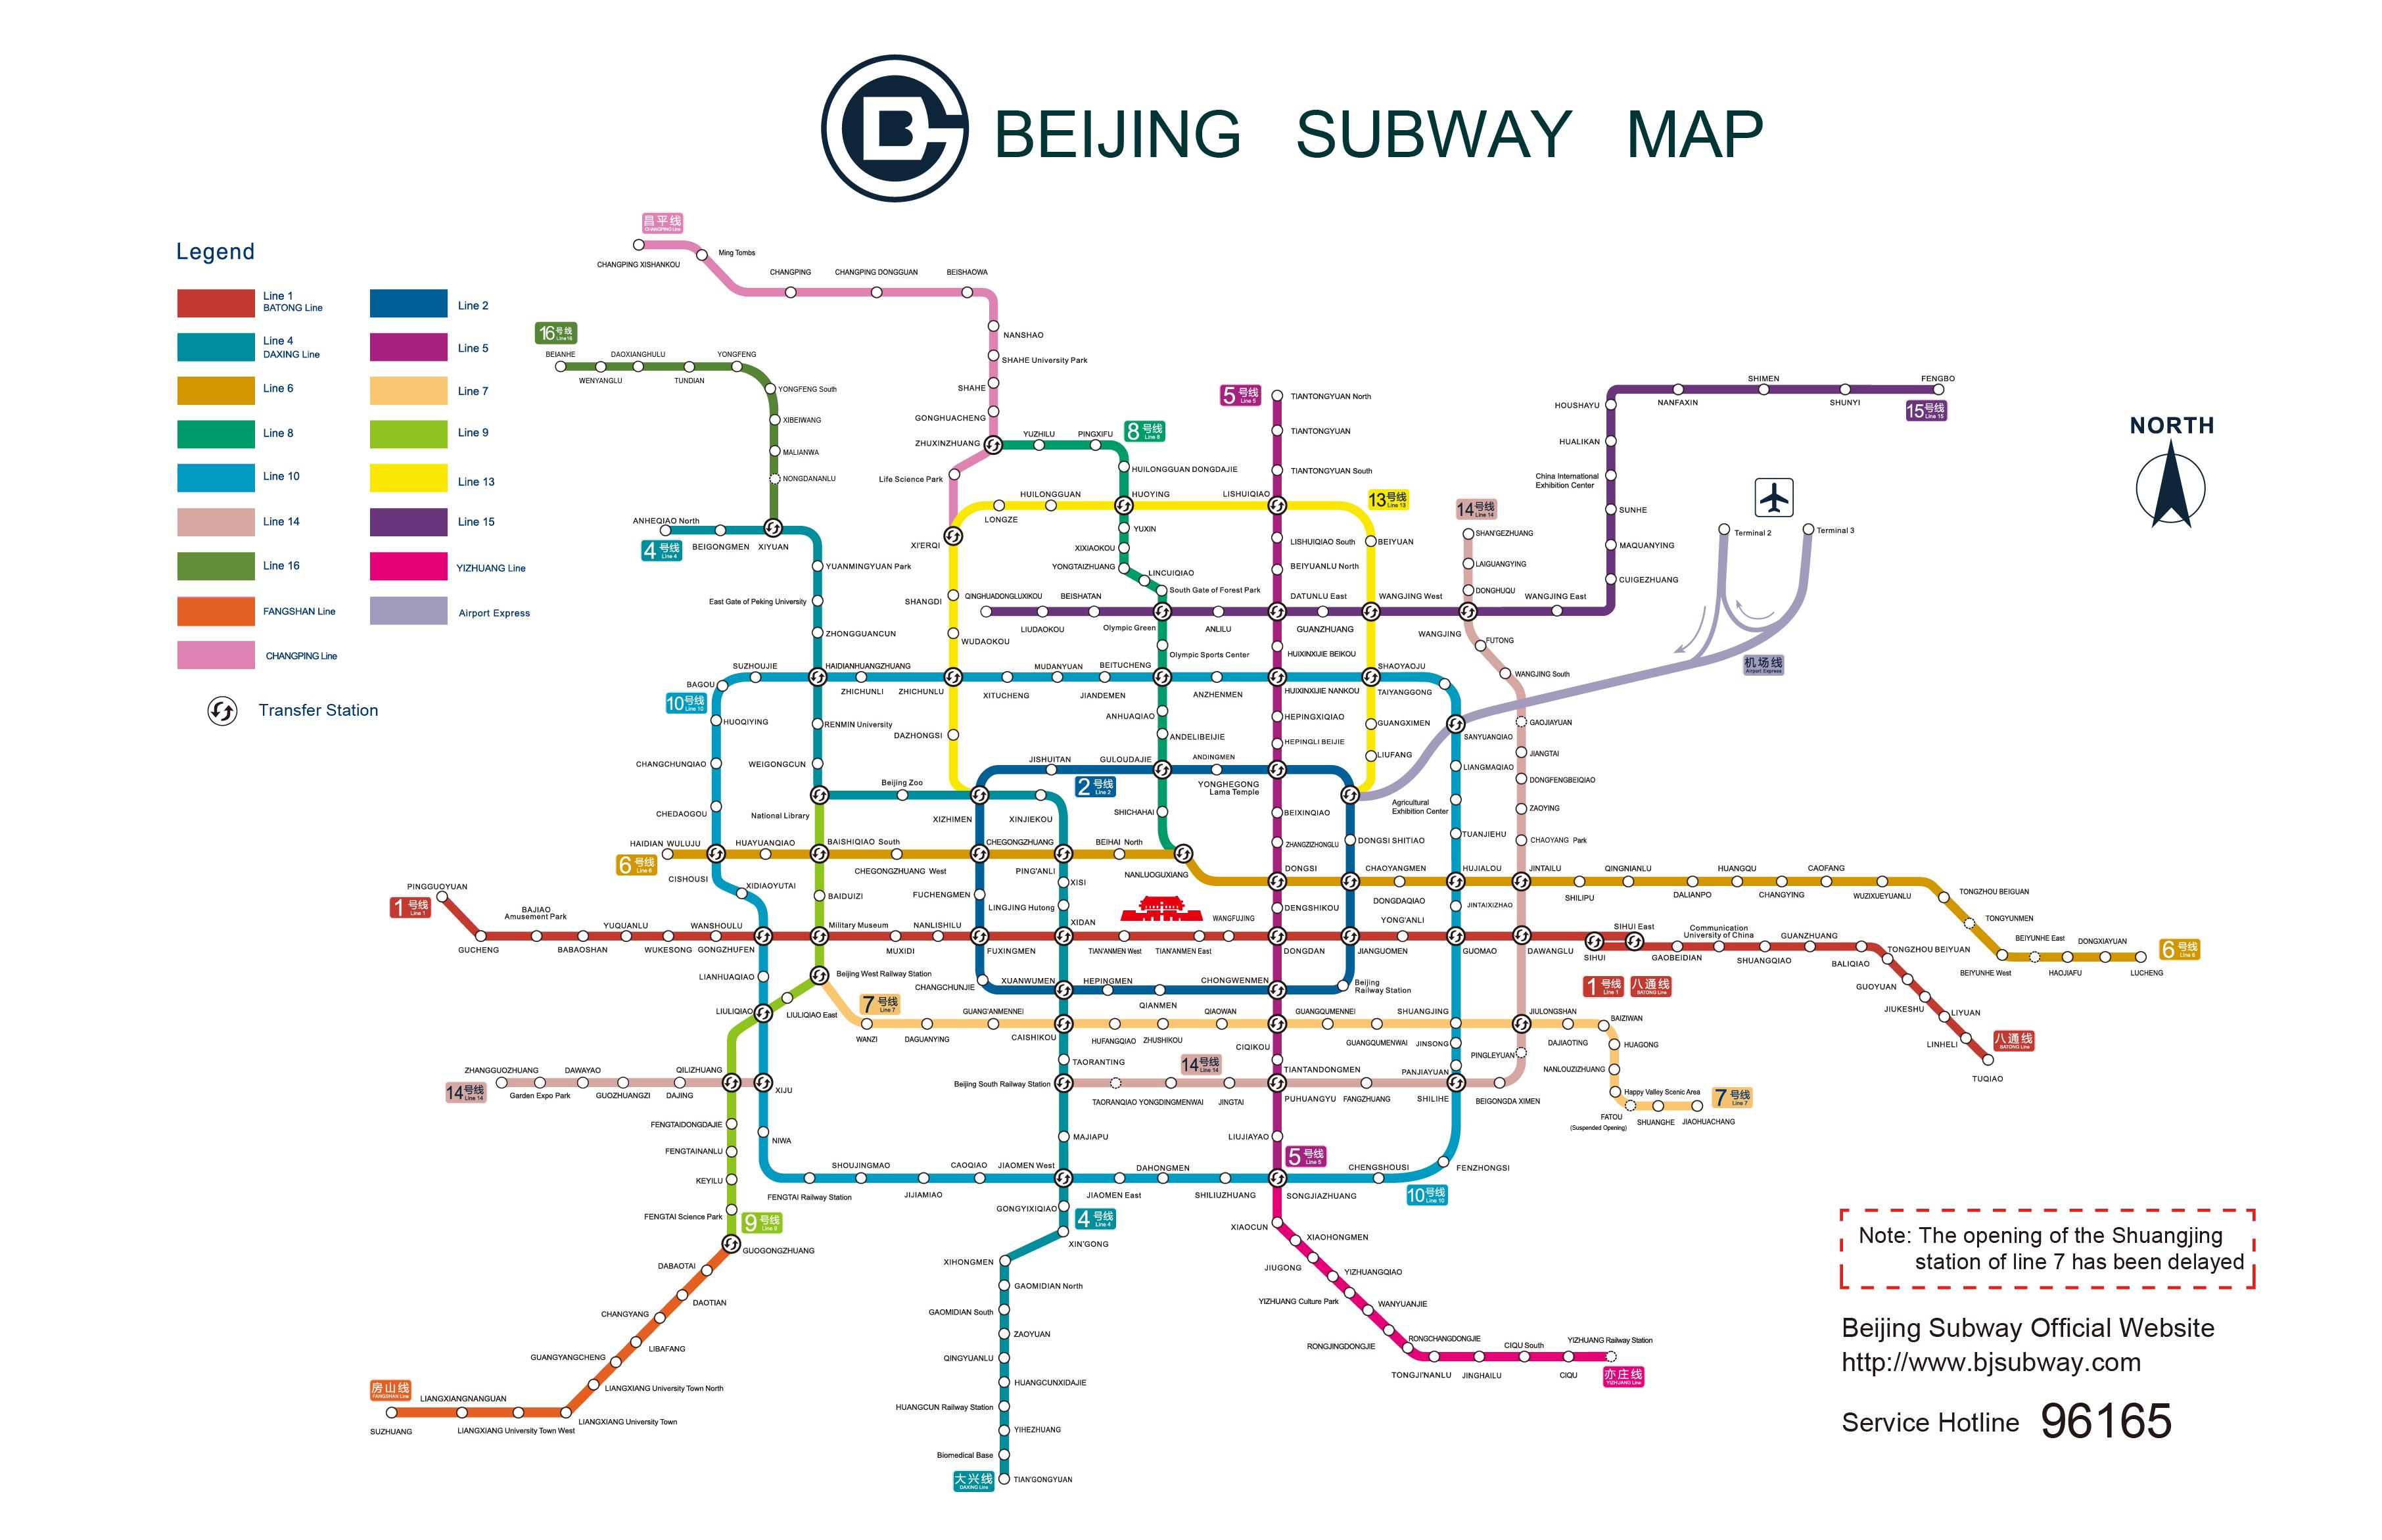 Bejing Subway Map 2018.Beijing Subway Bertagrama Traducciones